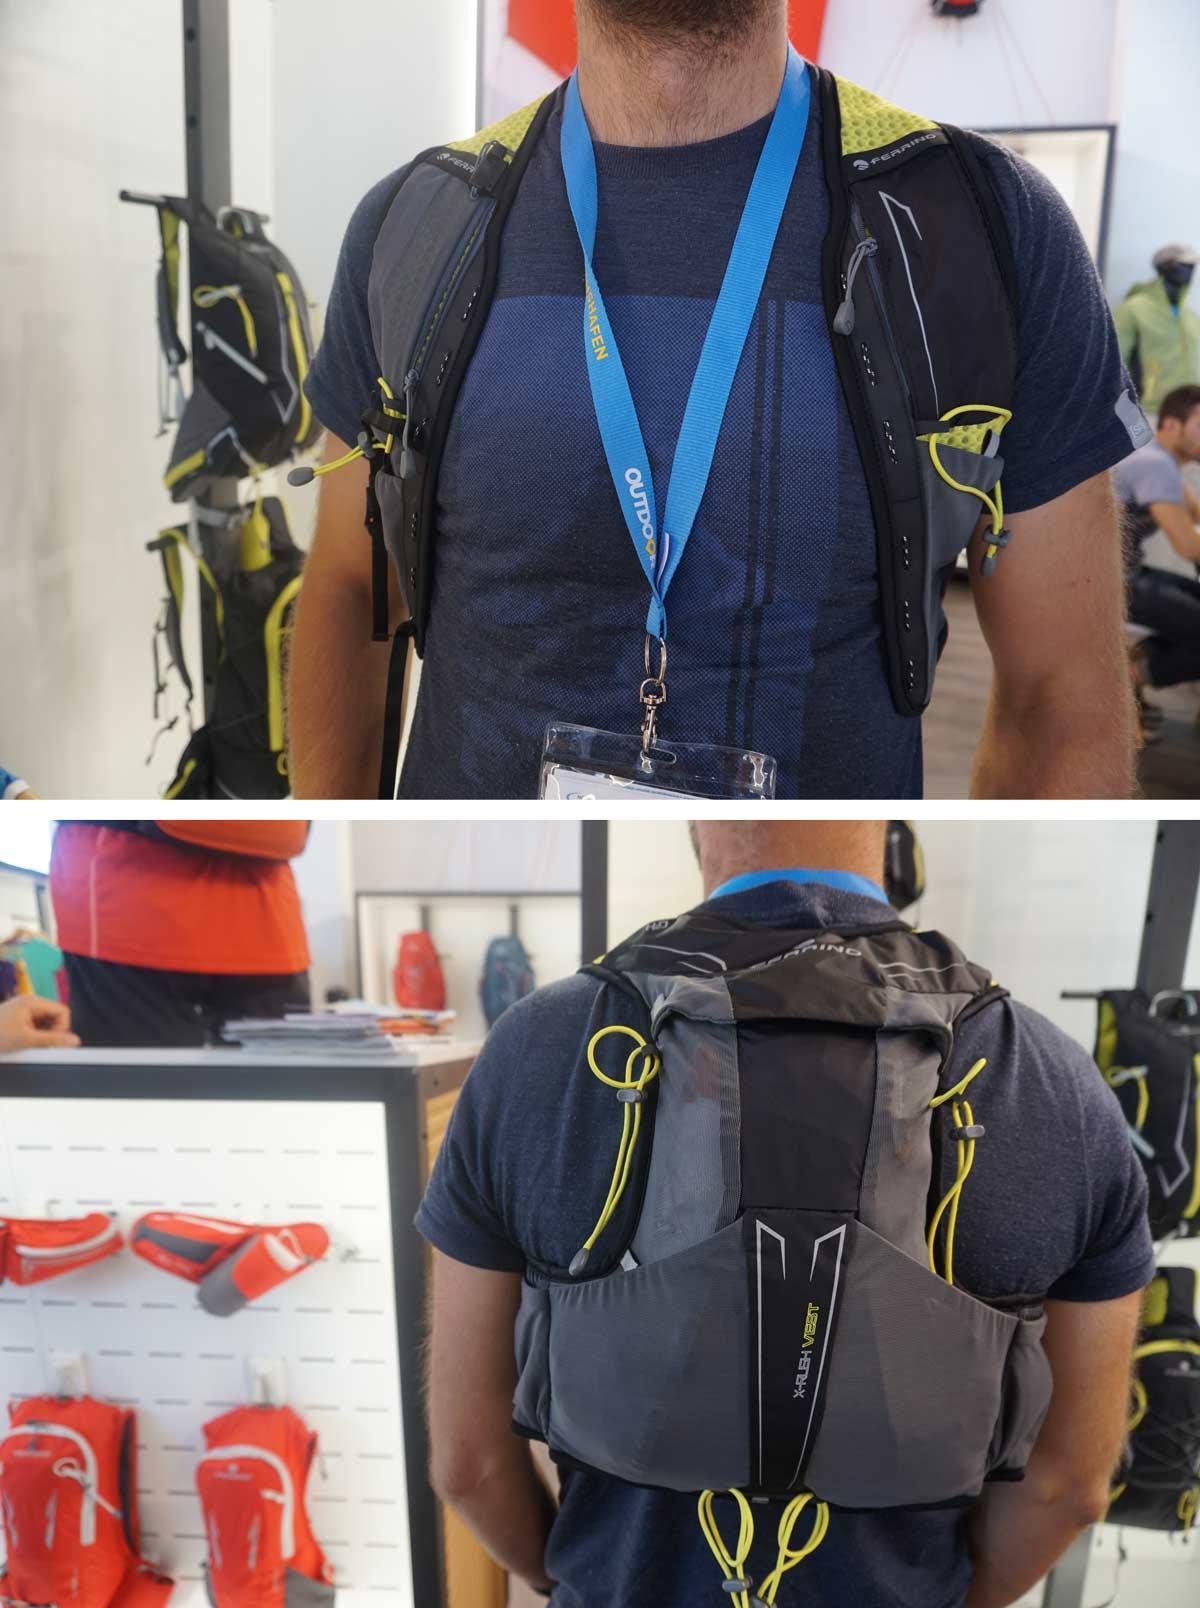 Bežecký batoh Ferrino X - track vest | trail run